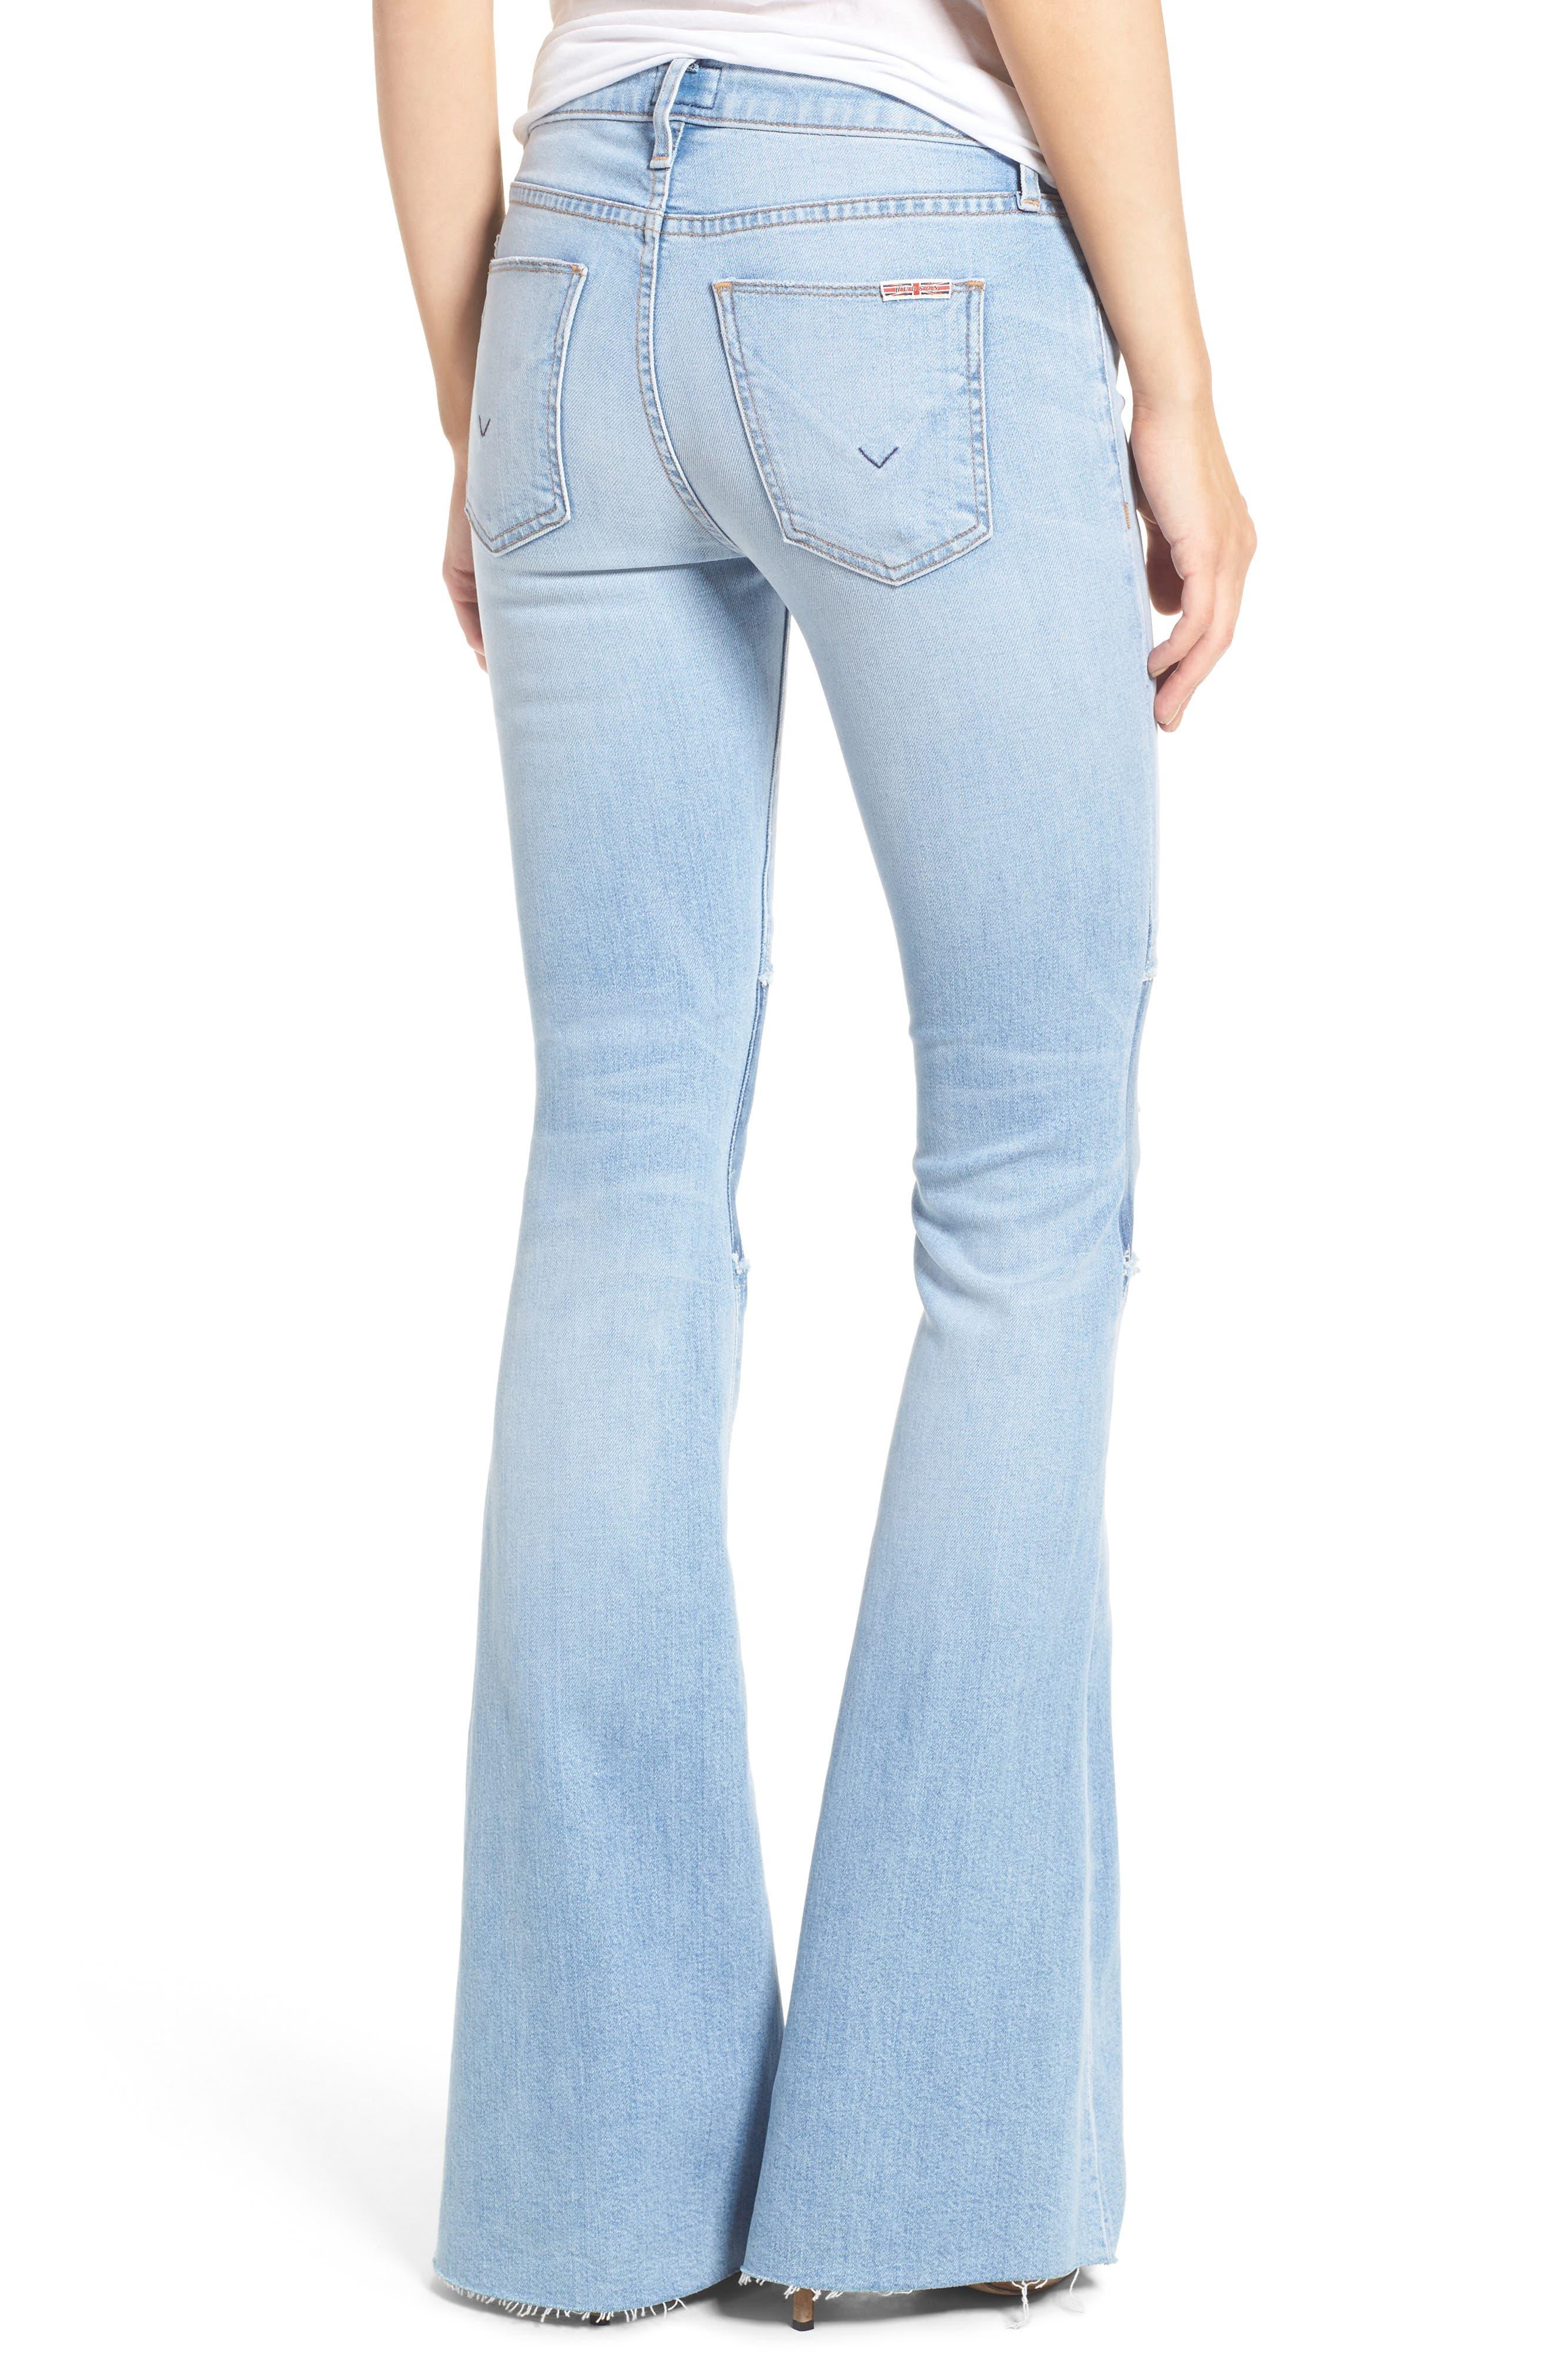 Alternate Image 2  - Hudson Jeans Mia Patchwork Flare Jeans (Royal Delta)